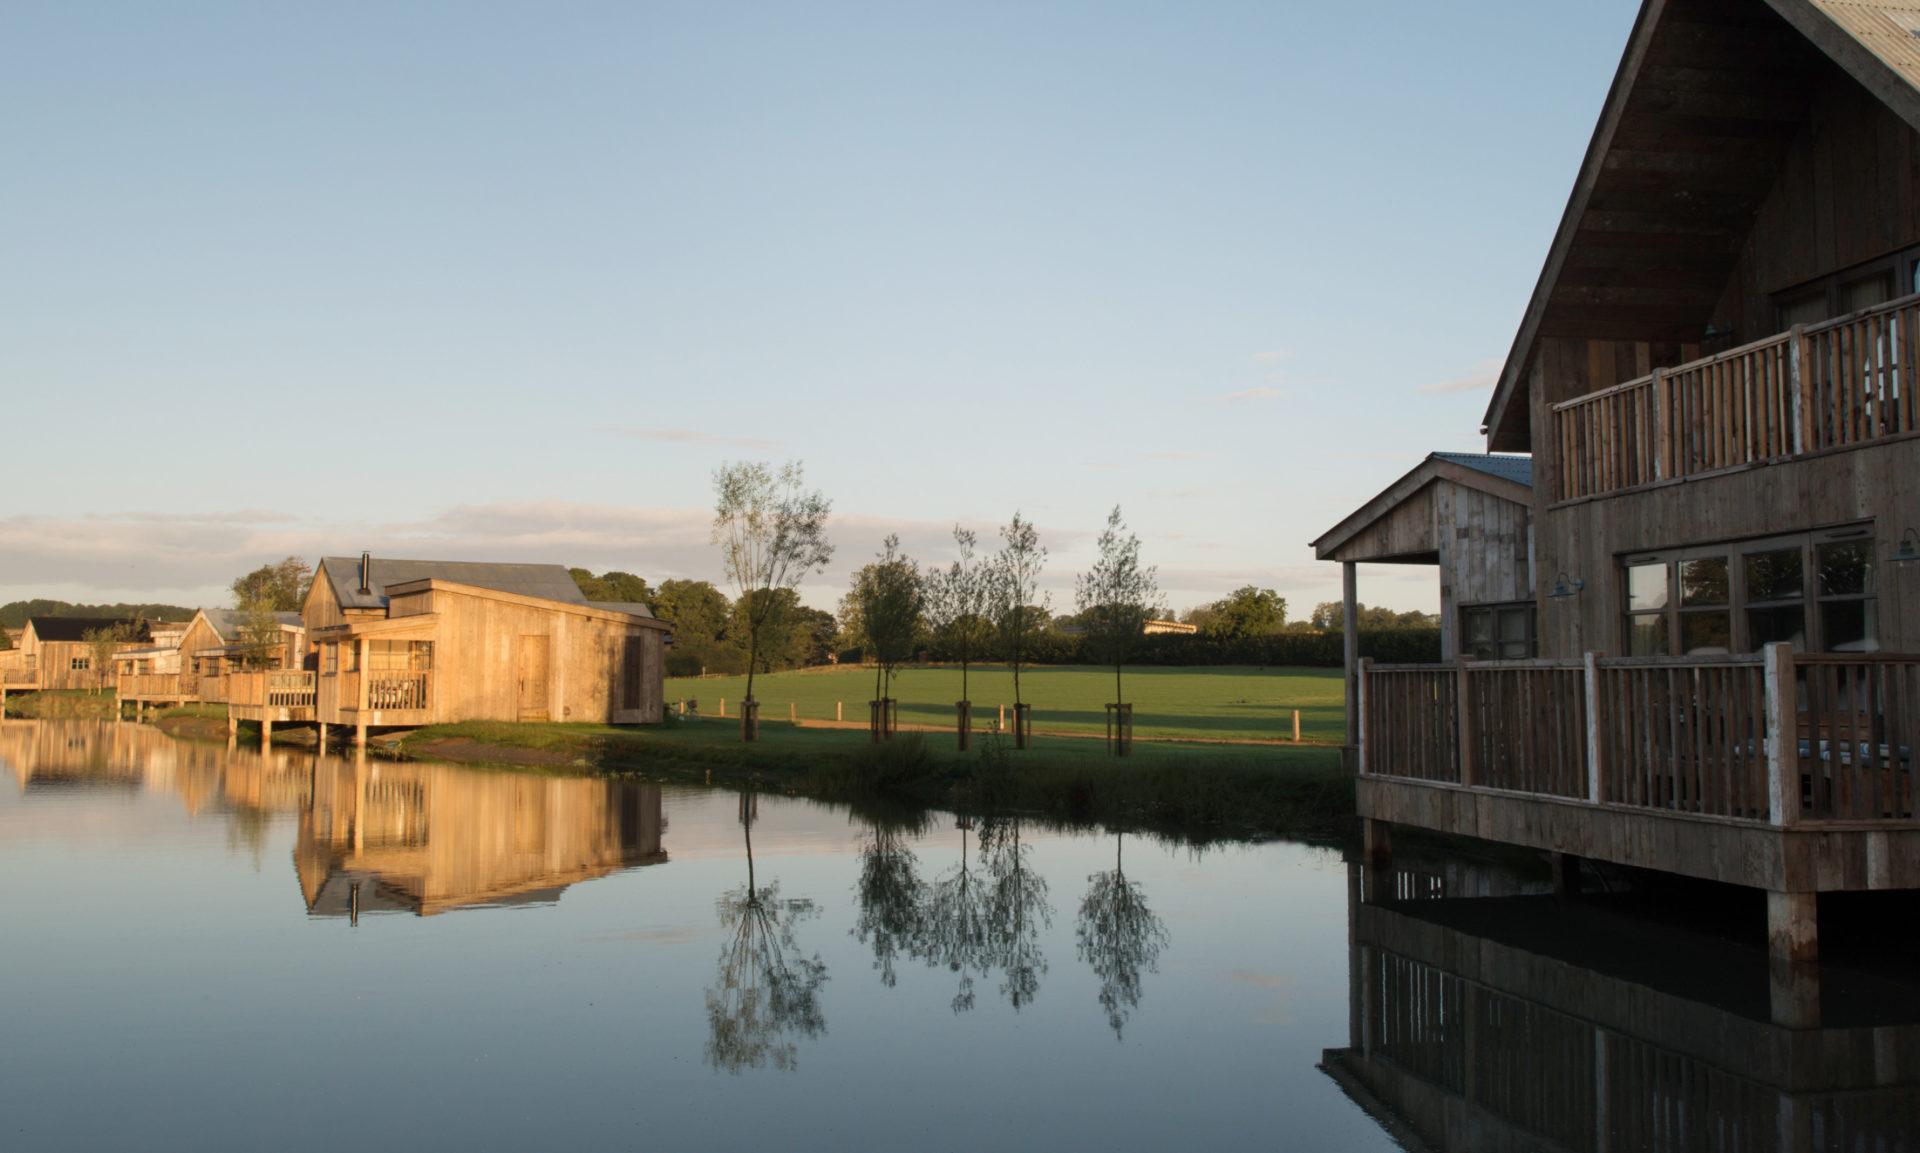 02a-soho-farmhouse-bedrooms-and-cabins-hero